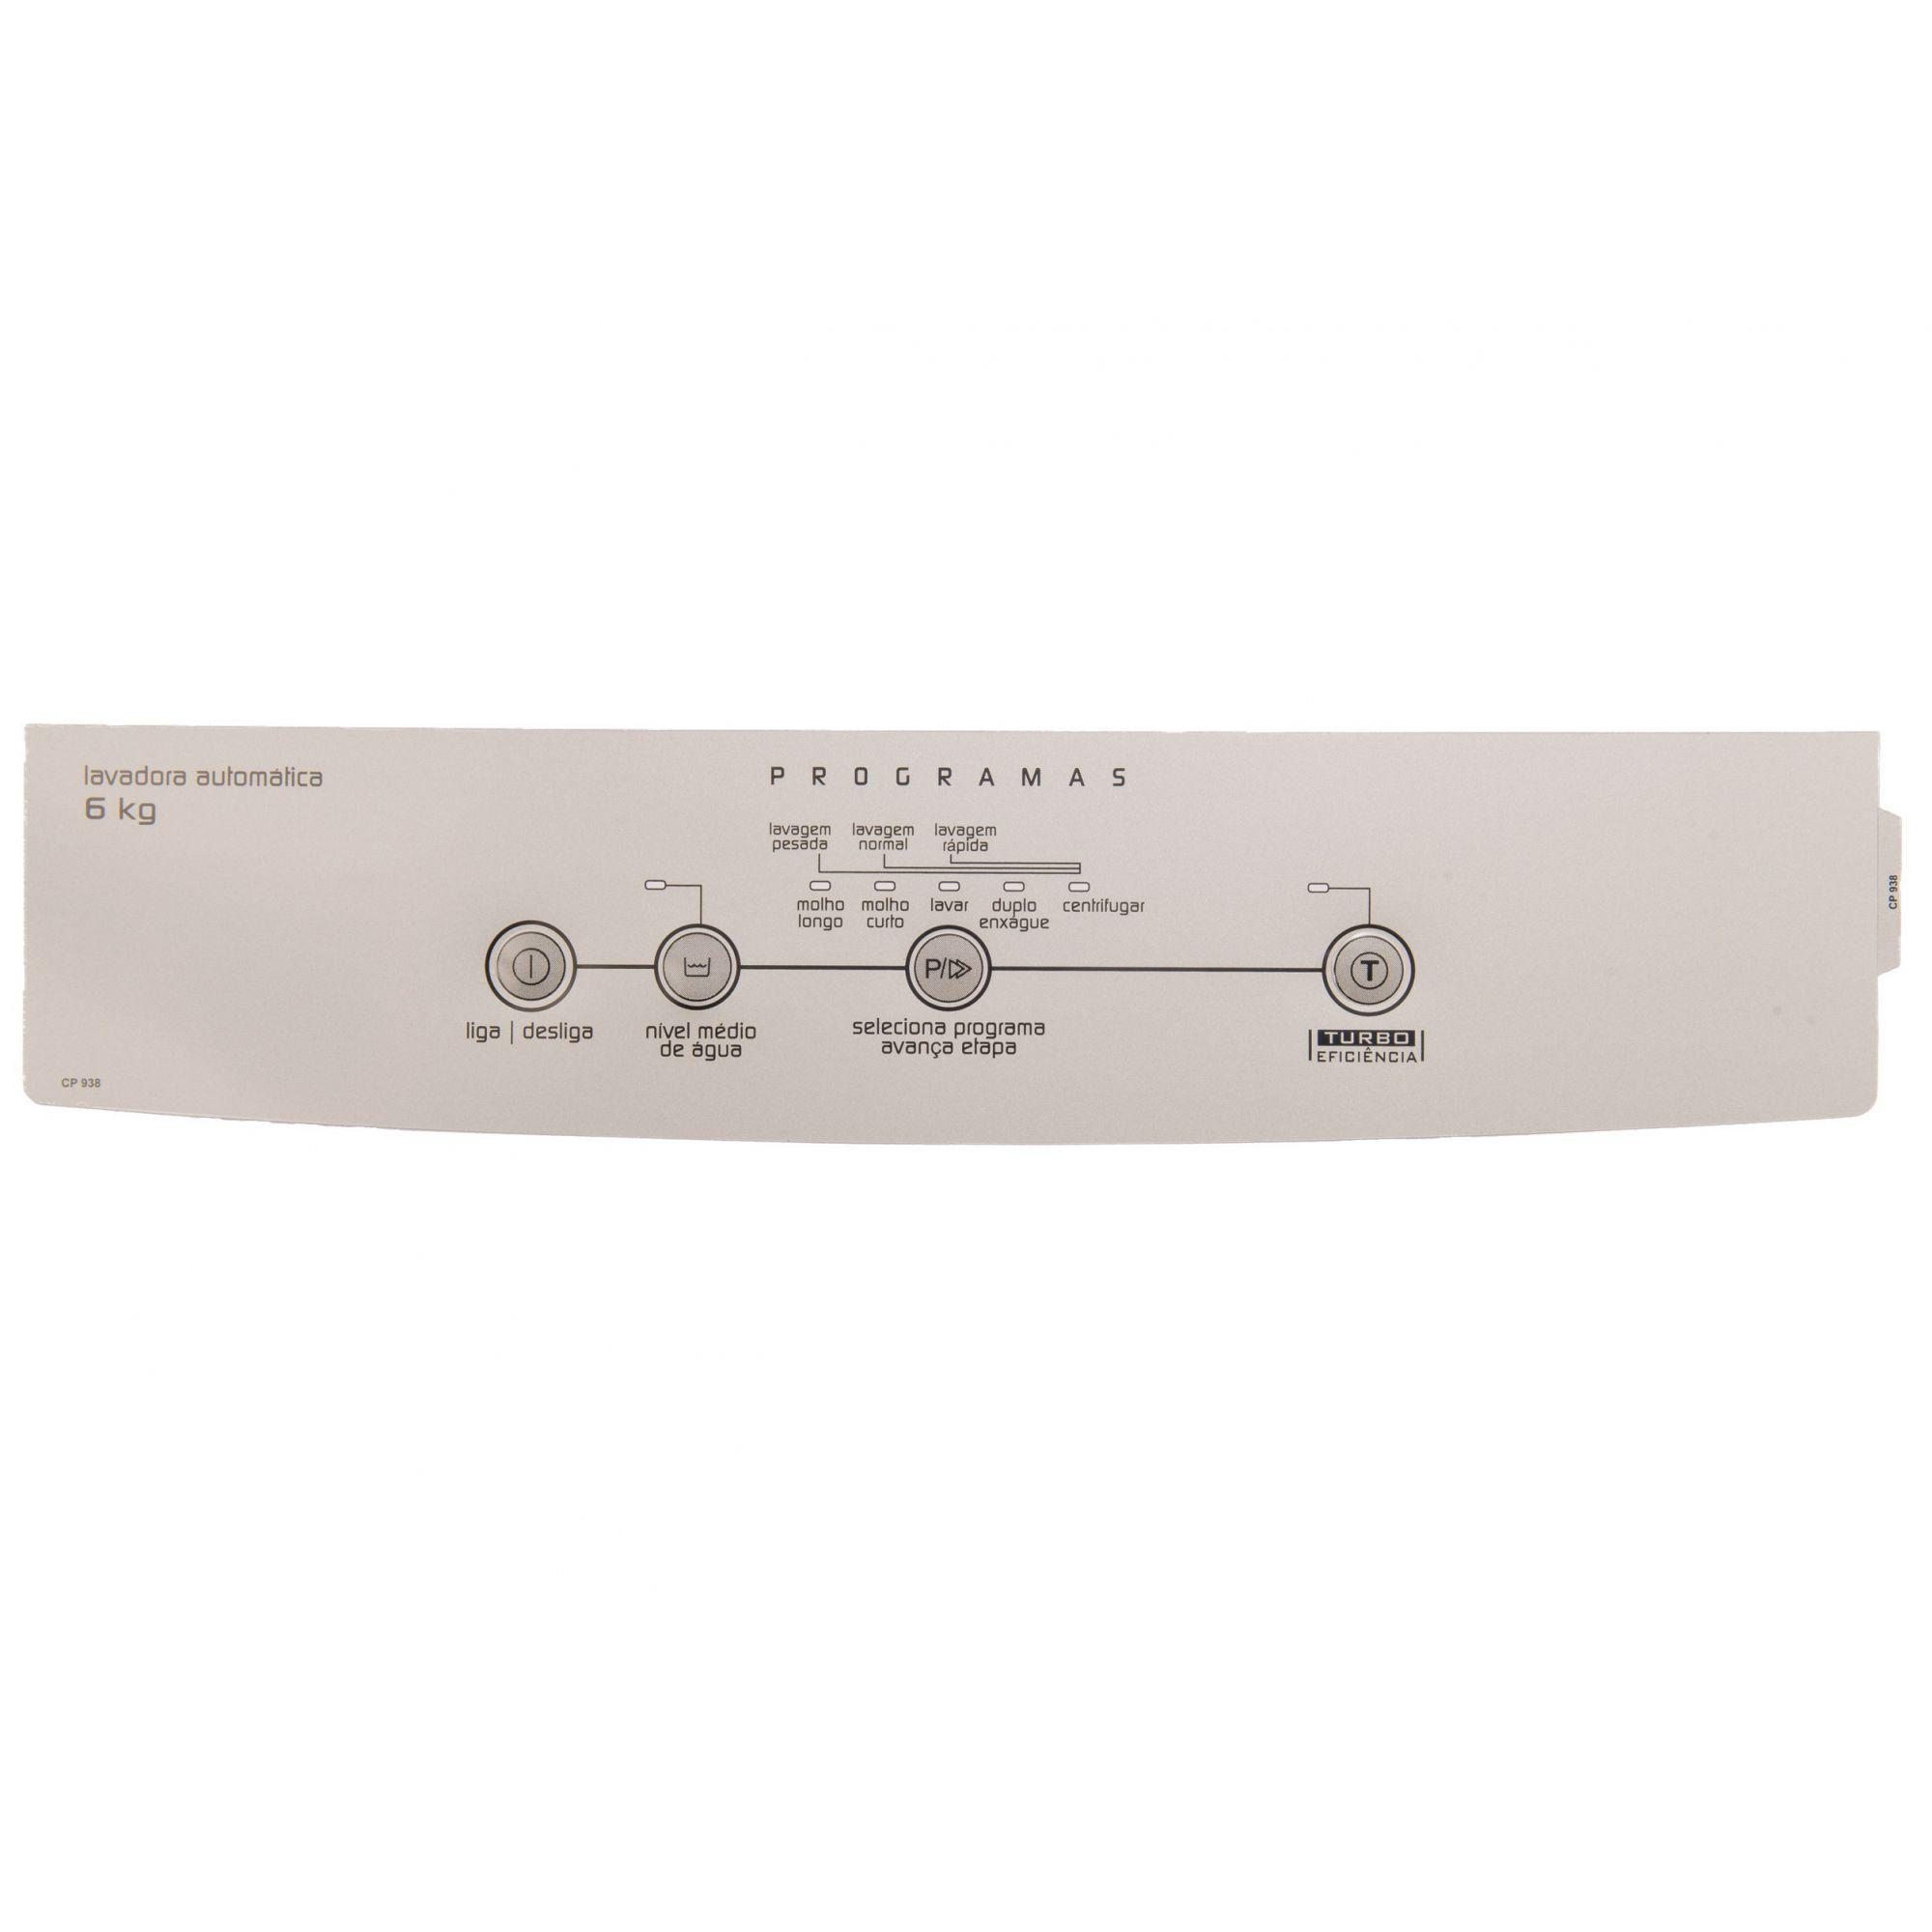 Painel Decorativo Compatível Lavadora BWC06A Turbo 6KG 326047487-CP0938